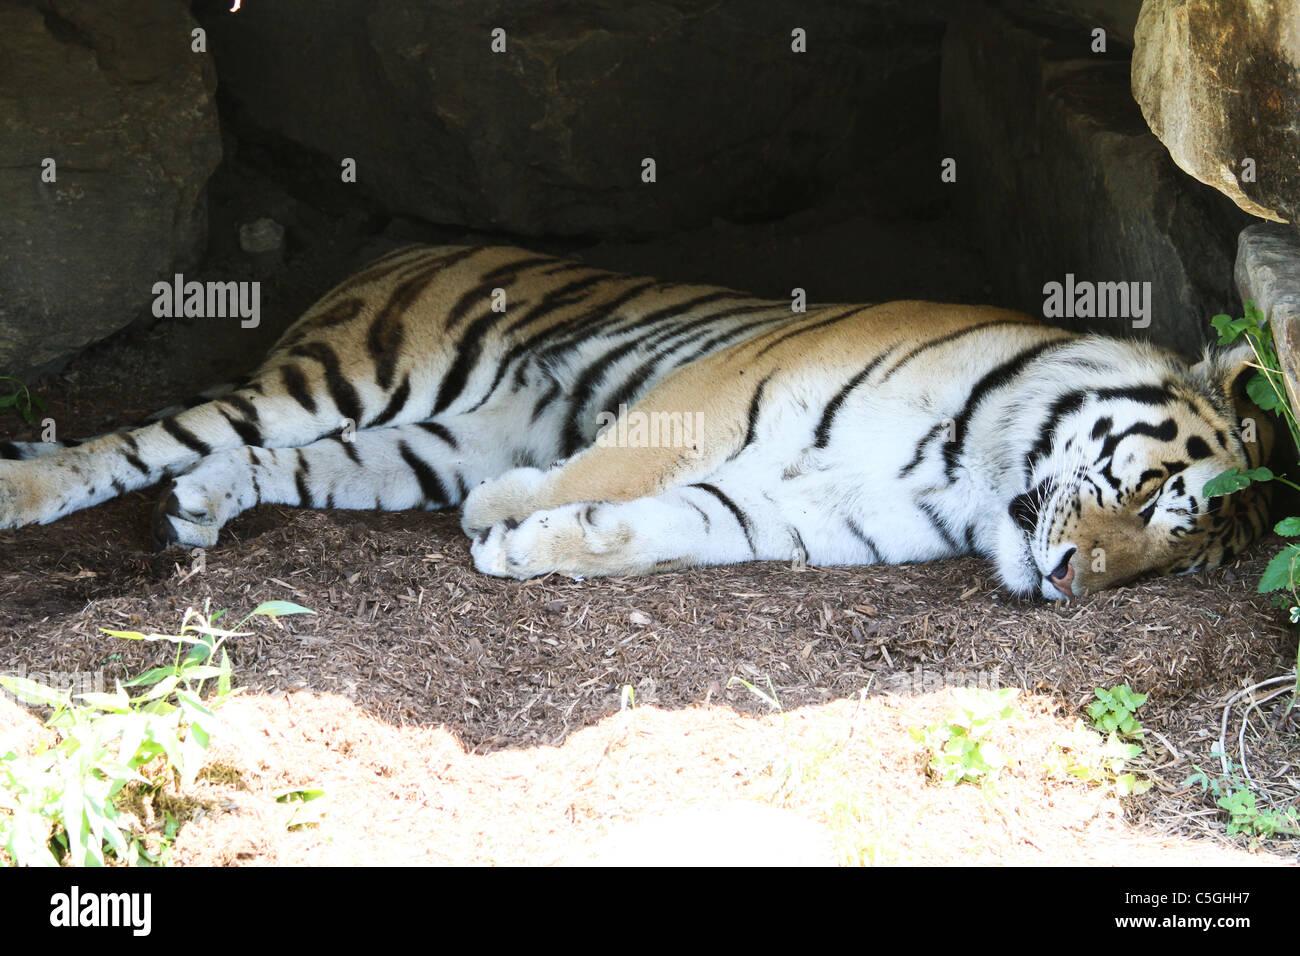 sleeping tiger cave - Stock Image